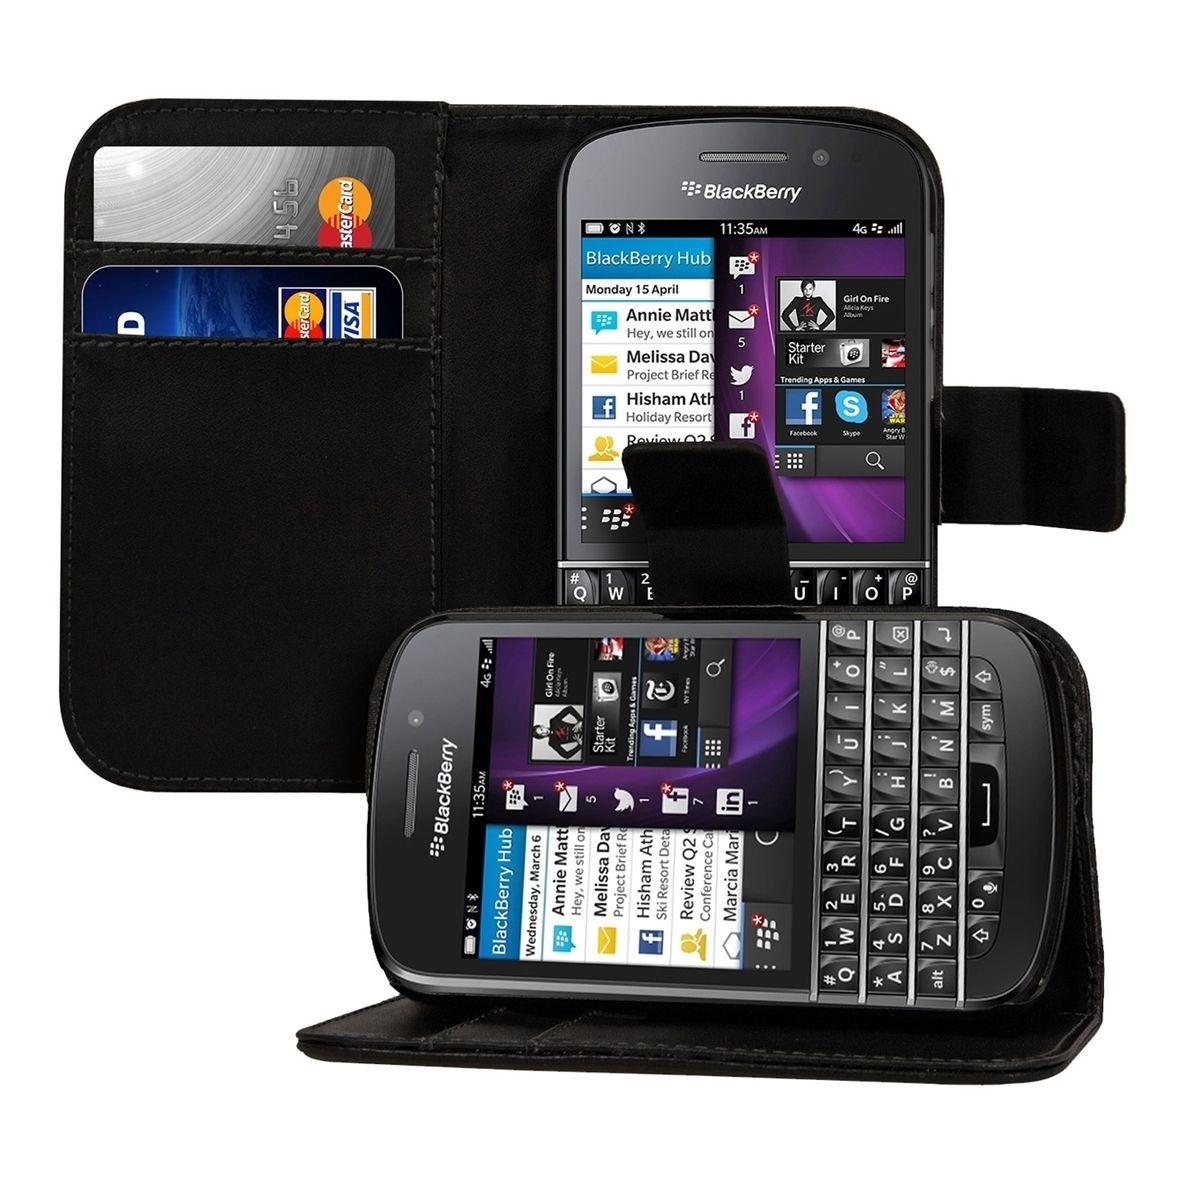 Pouzdro pro BlackBerry Q10 černé